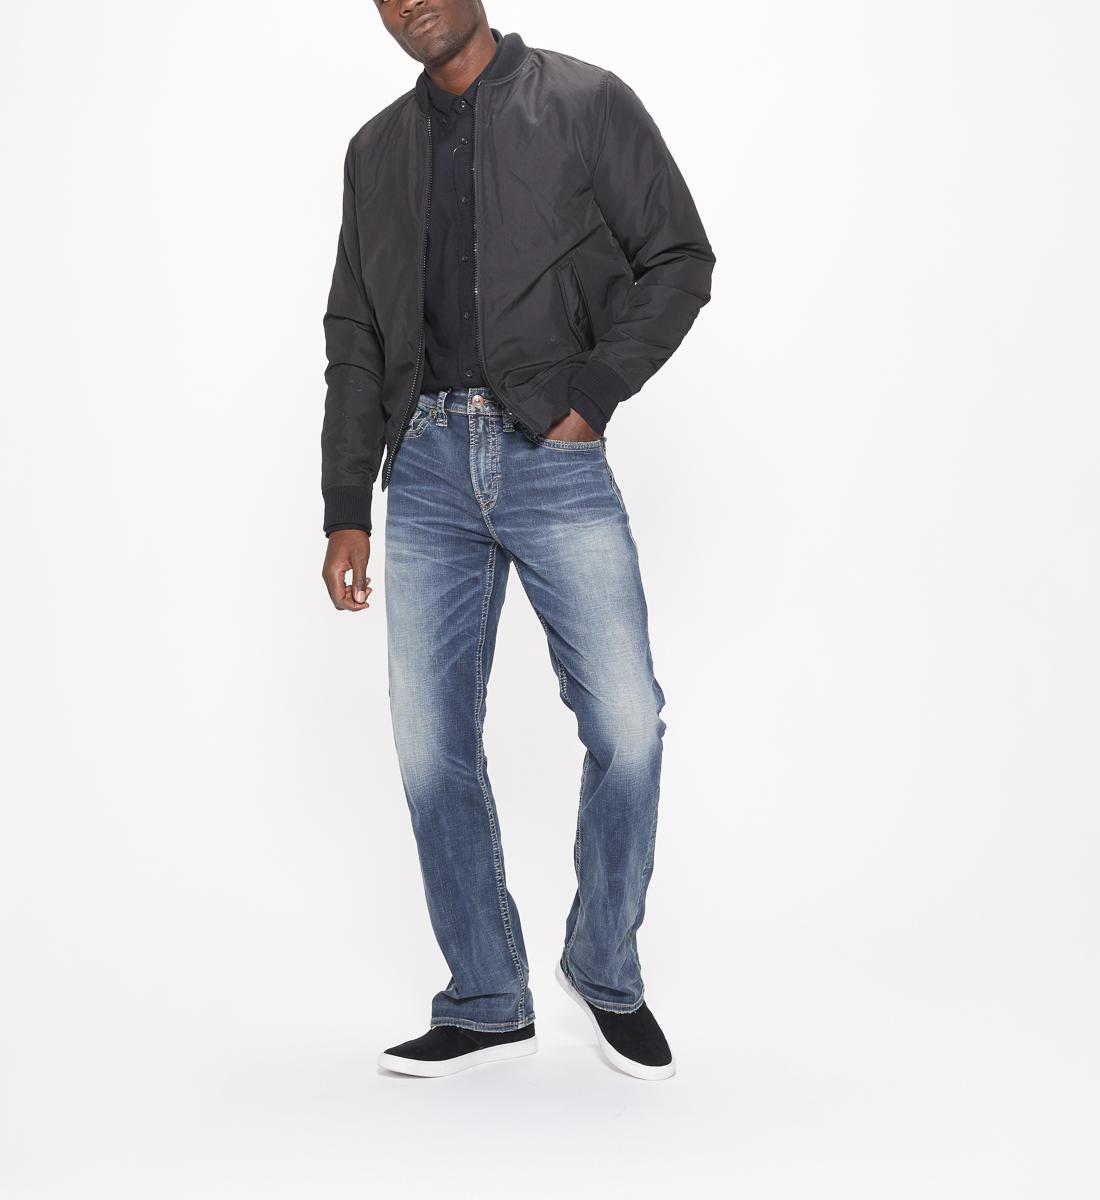 Silver Jeans Craig Bootcut Mens Dark Wash